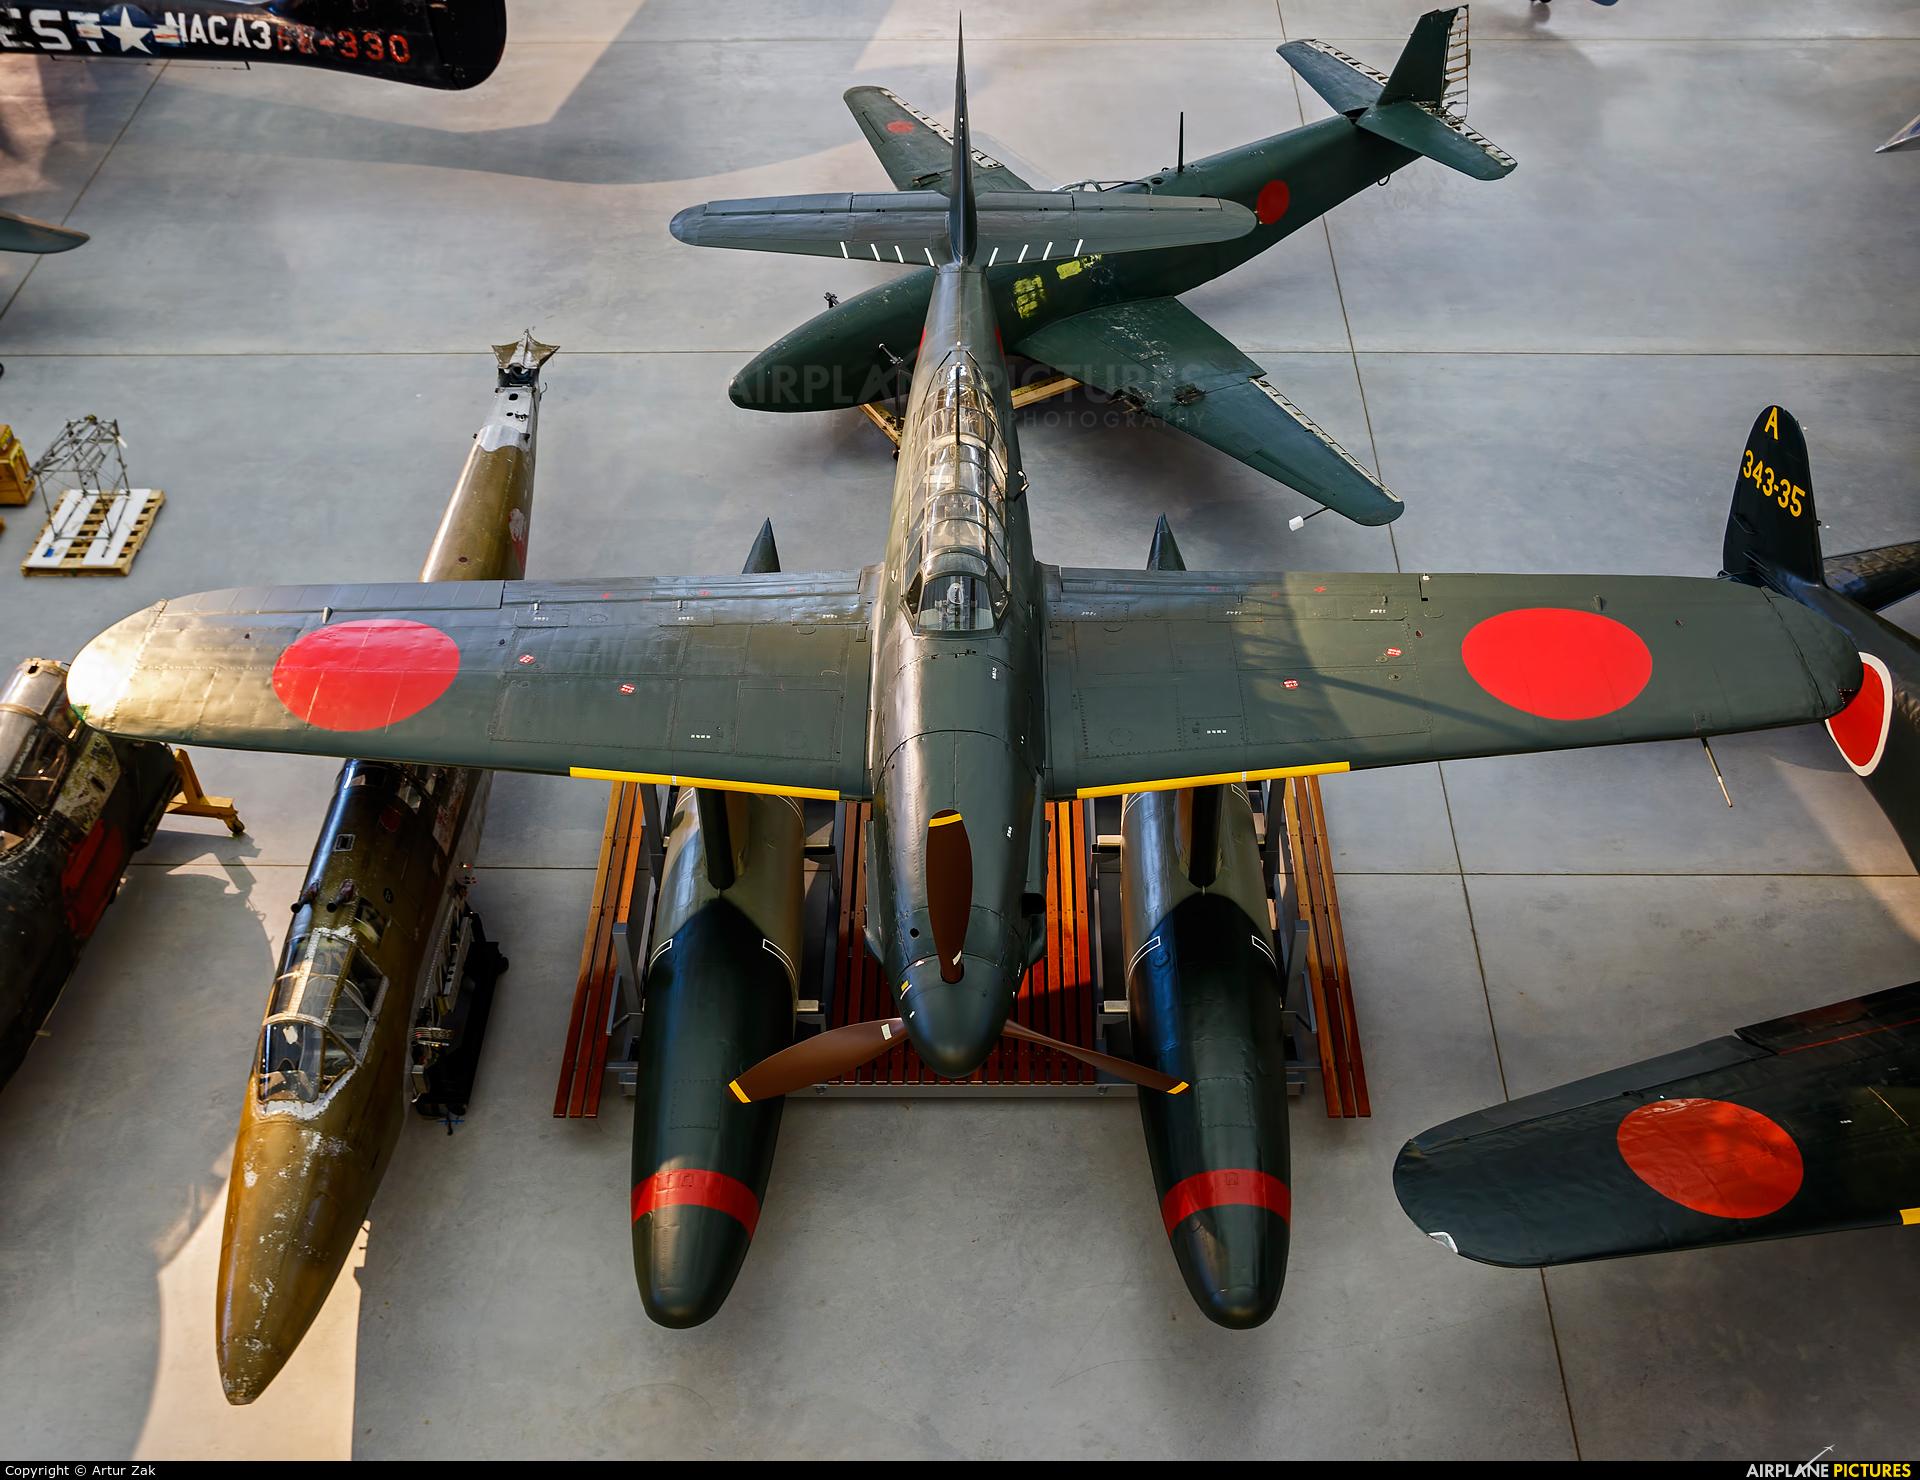 Japan - Imperial Navy (WW2) - aircraft at Steven F. Udvar-Hazy Center